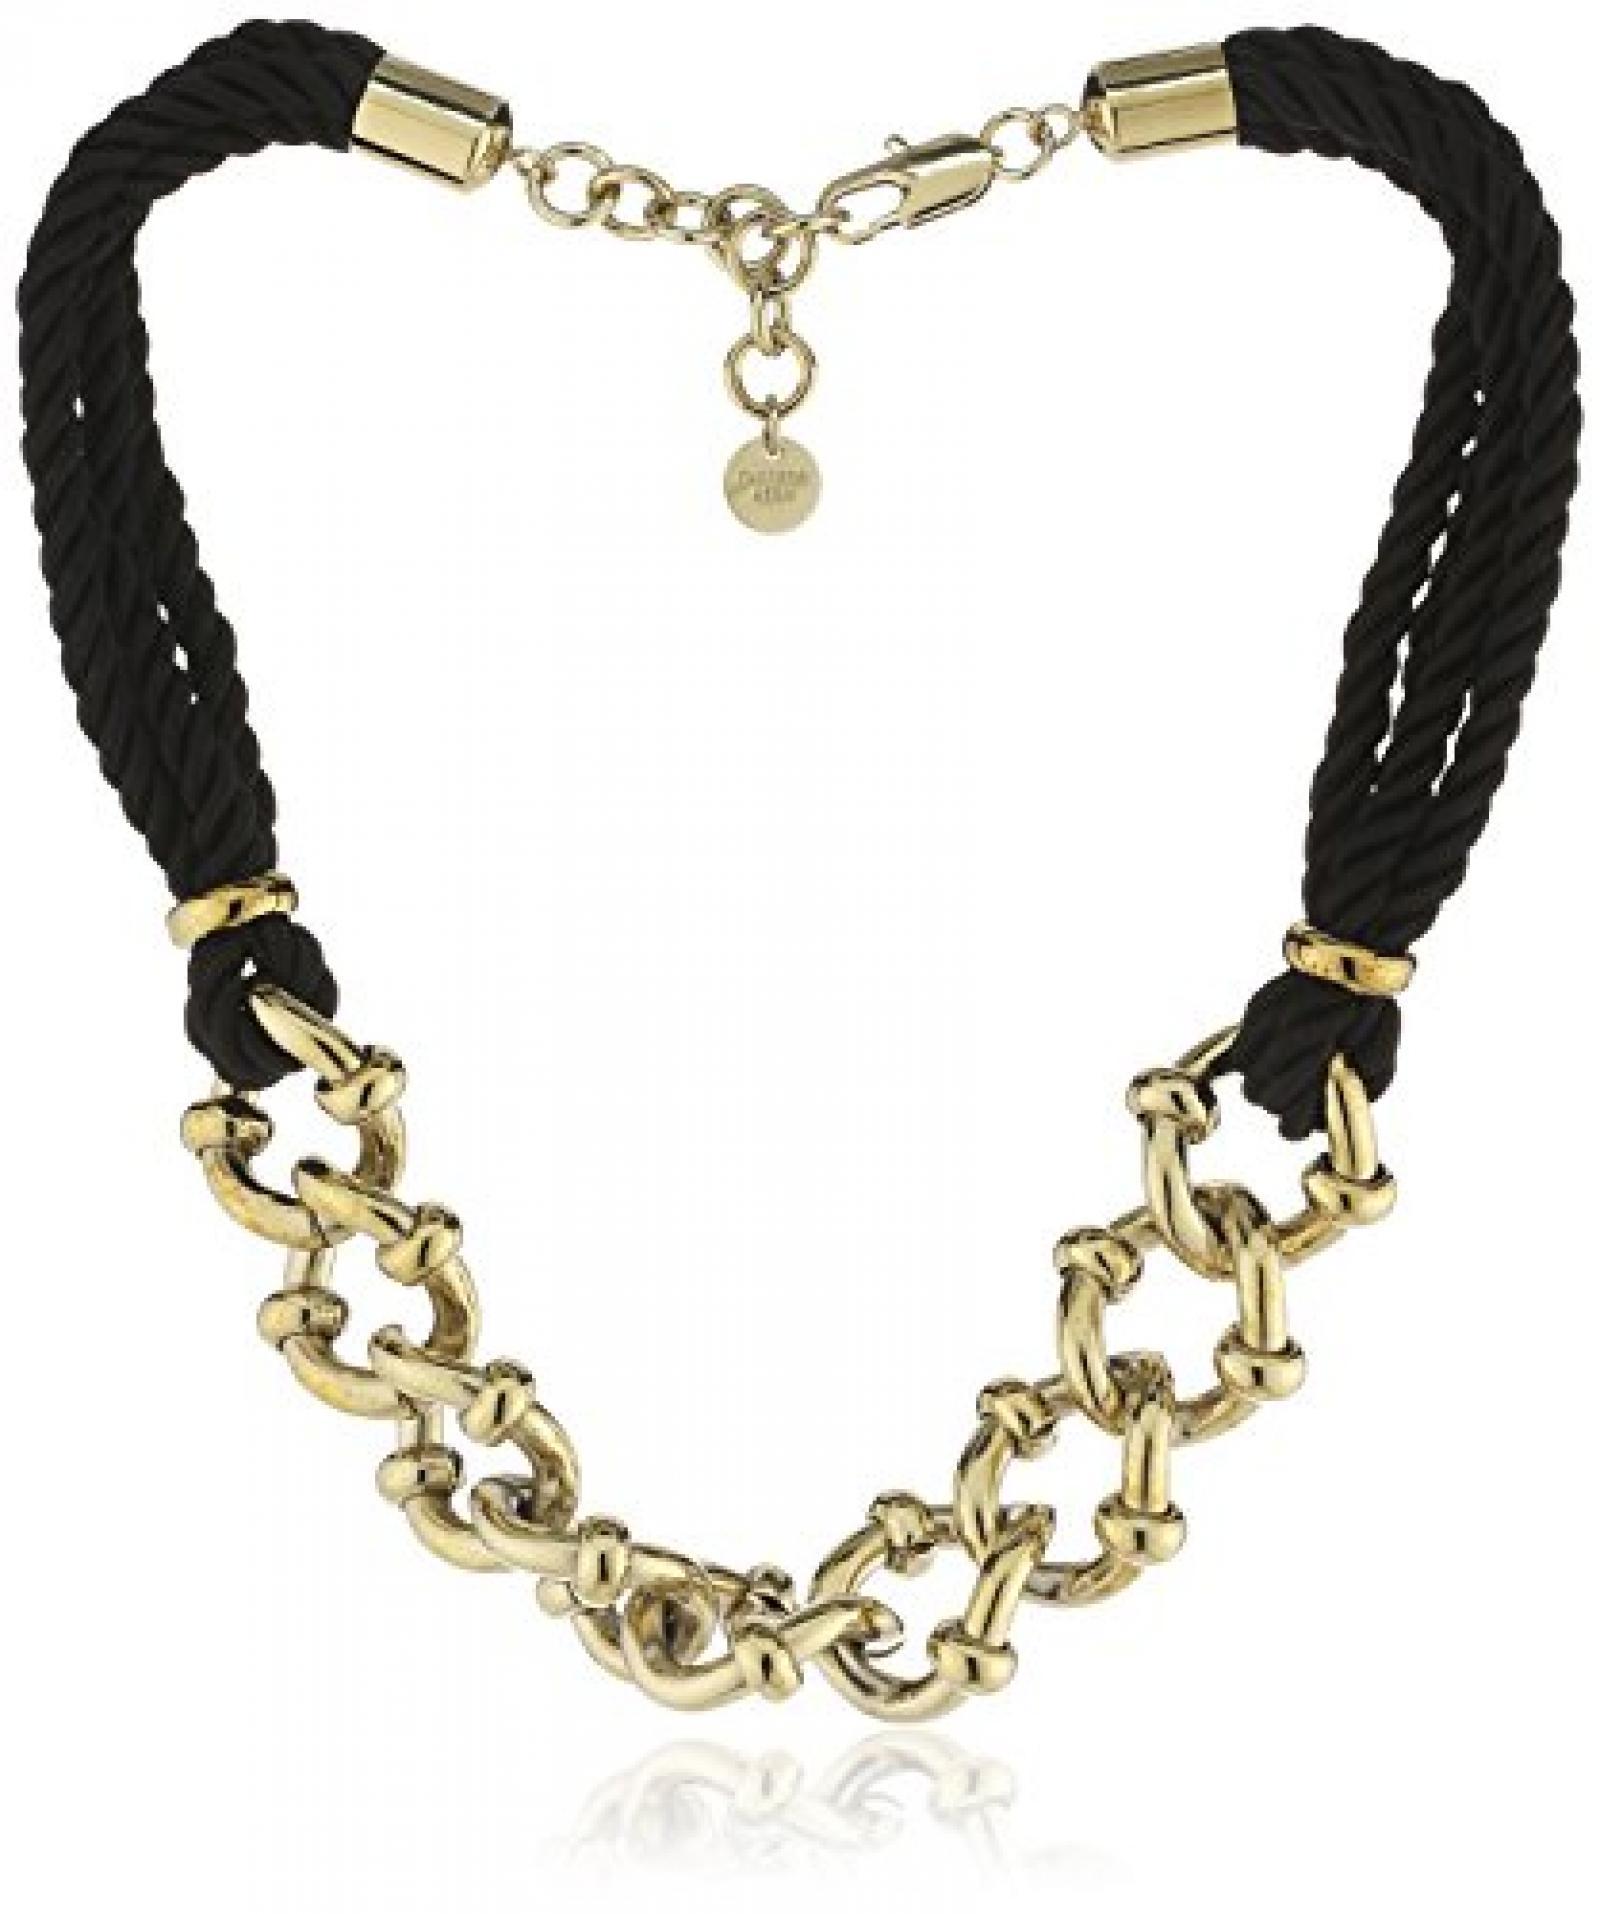 Dyrberg/Kern Damen Halskette Vergoldetes Metall Stoff Swarovski-Kristall 336246